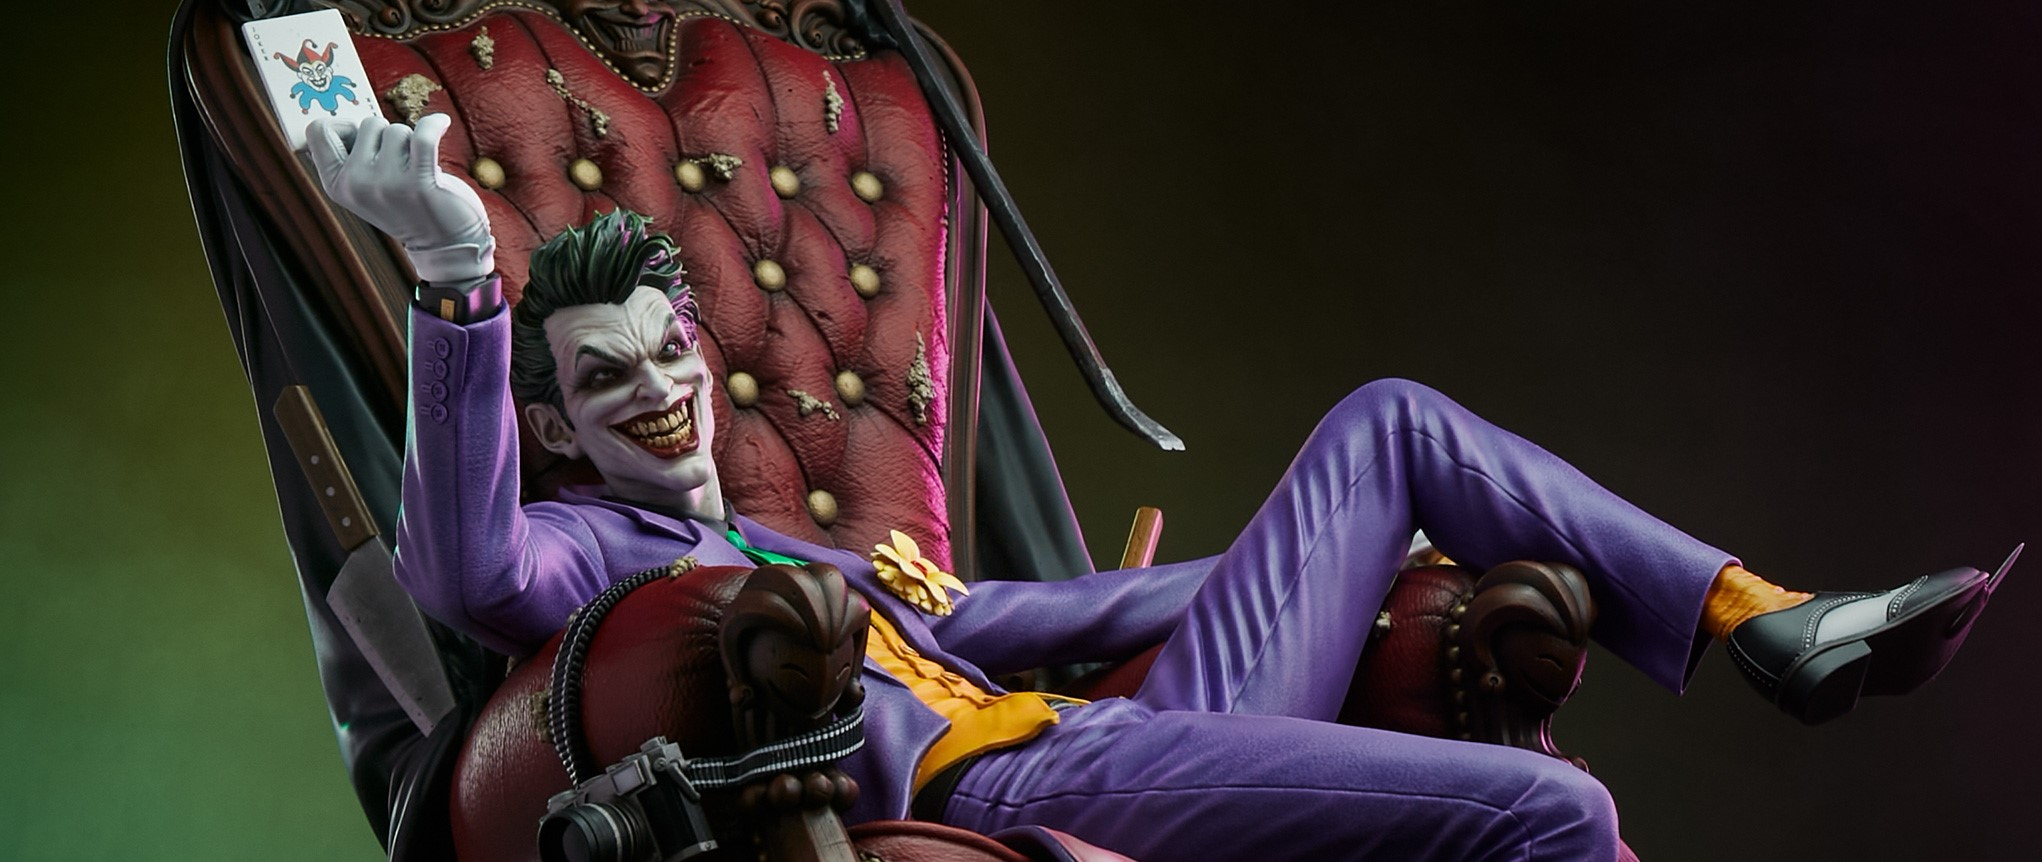 Tweeterhead Joker Maquetter